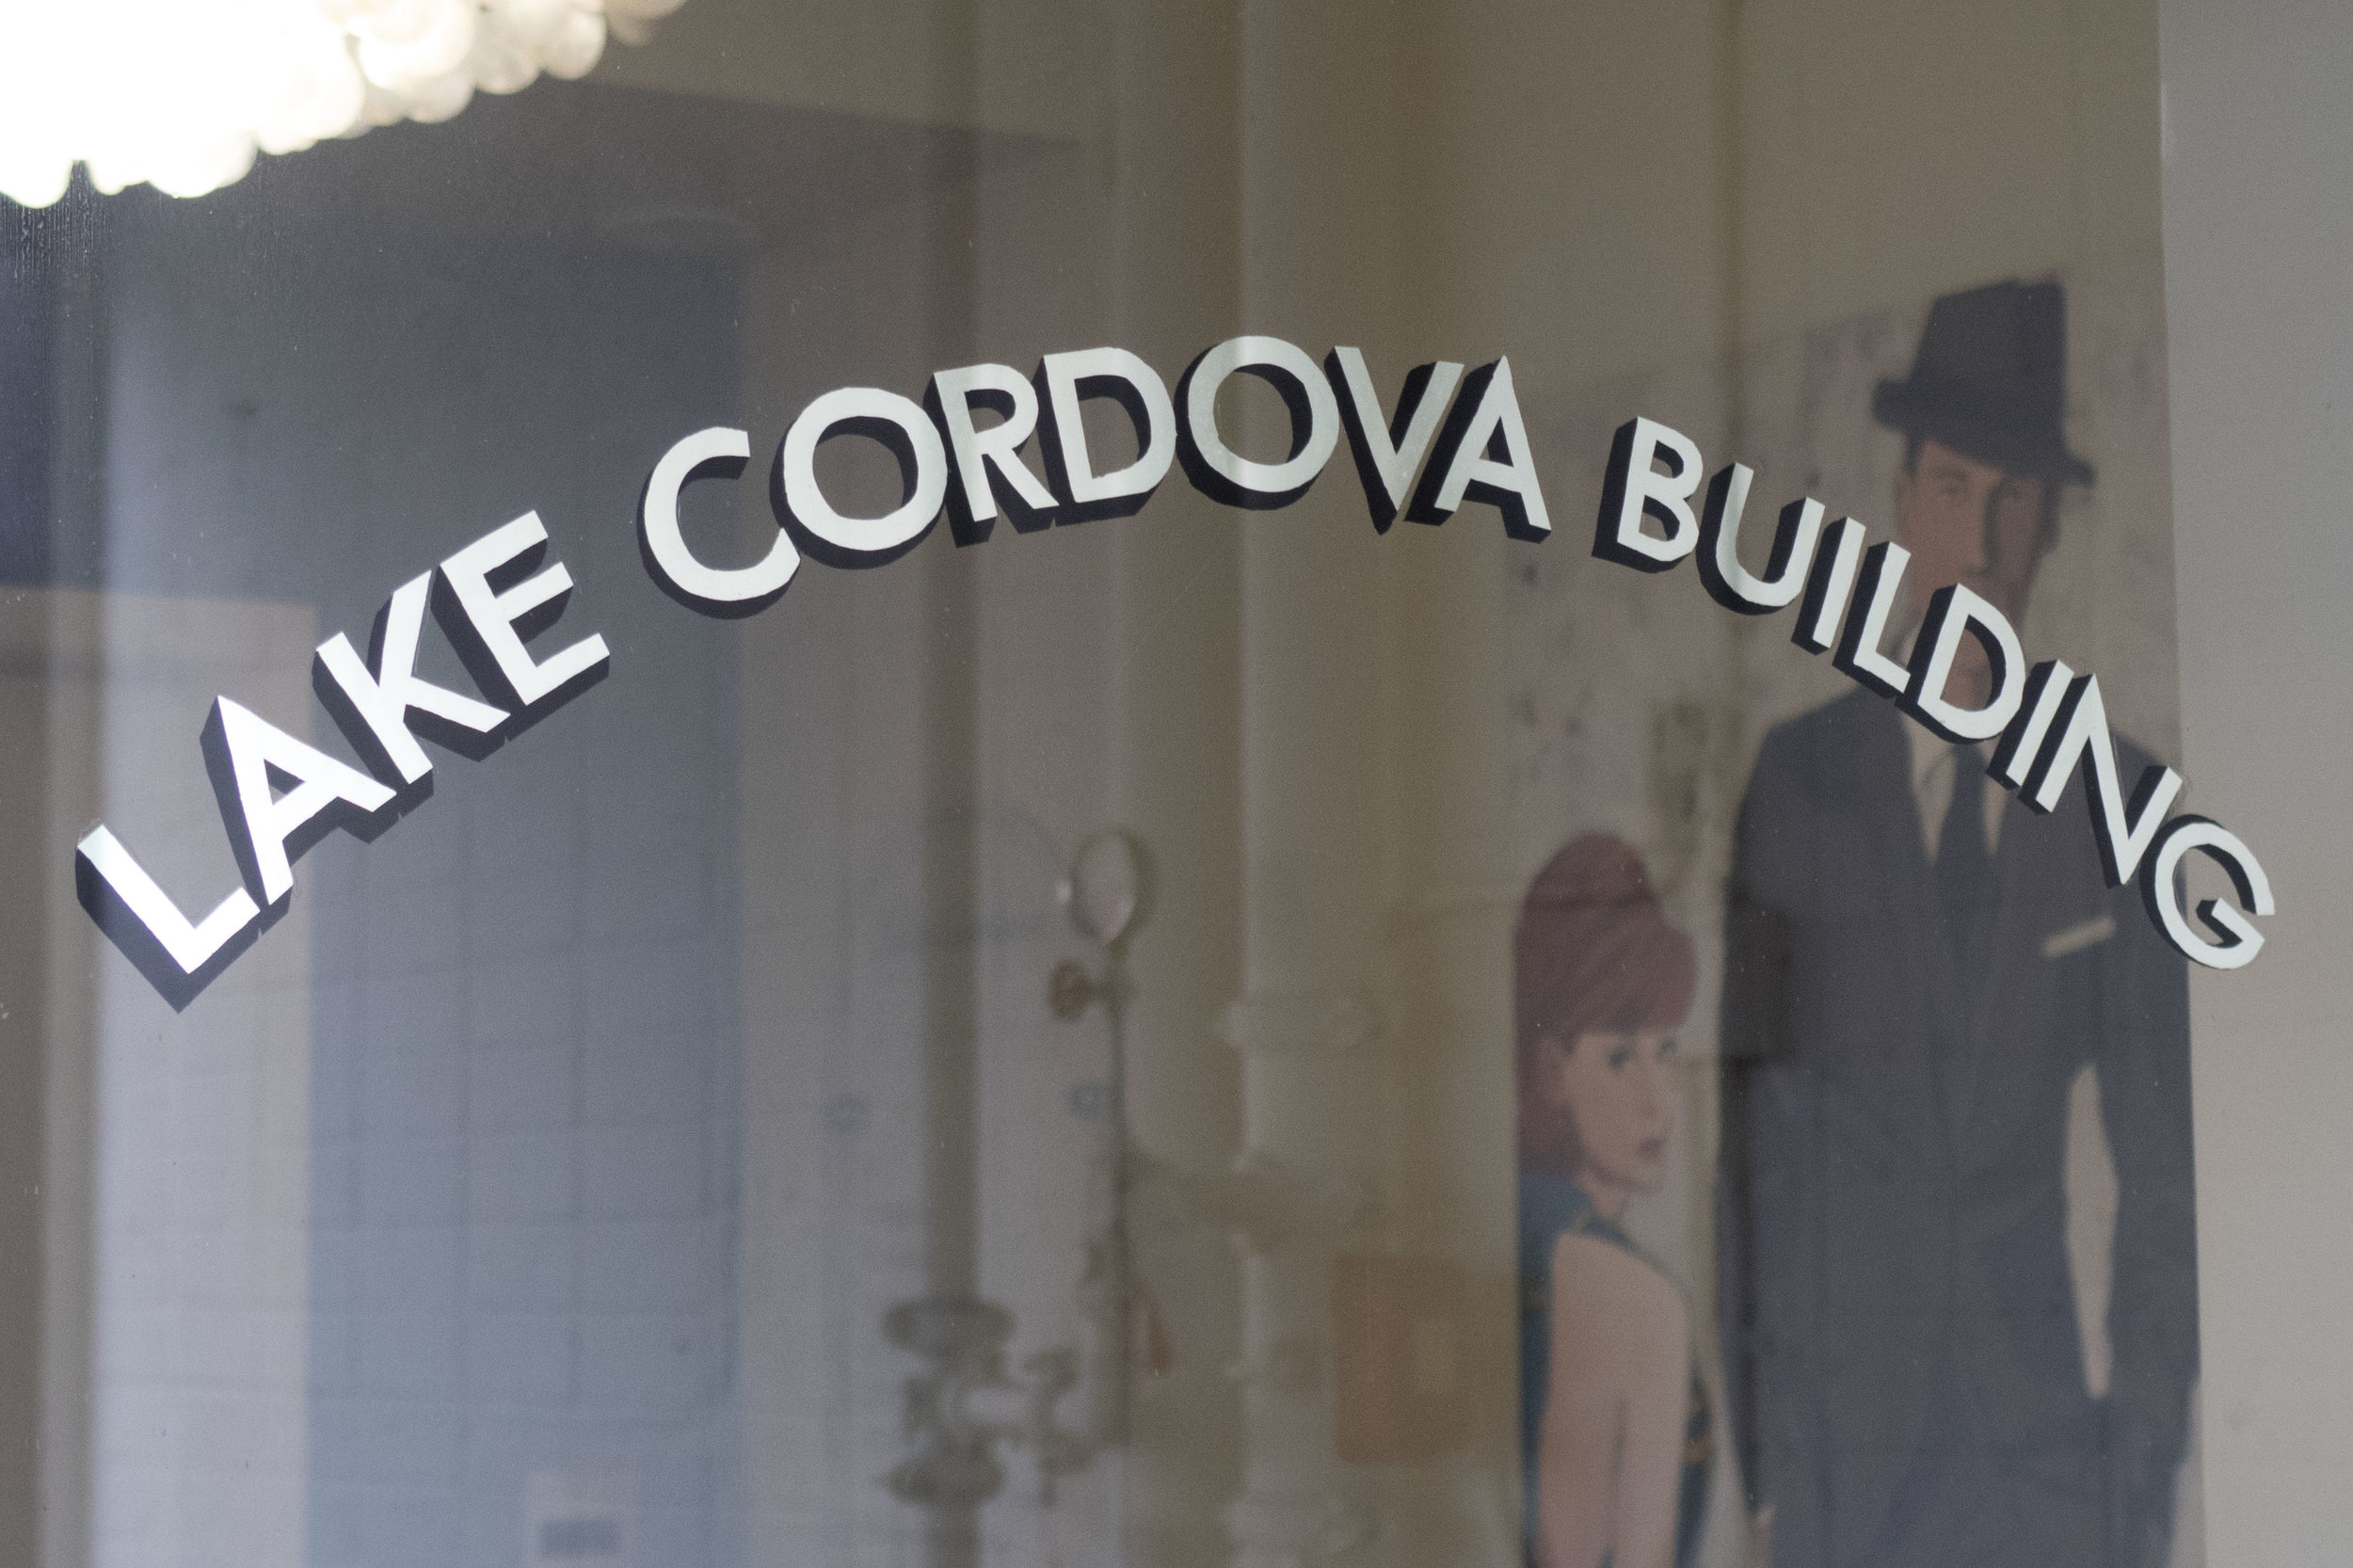 LakeCordova2017-055_6x9.jpg